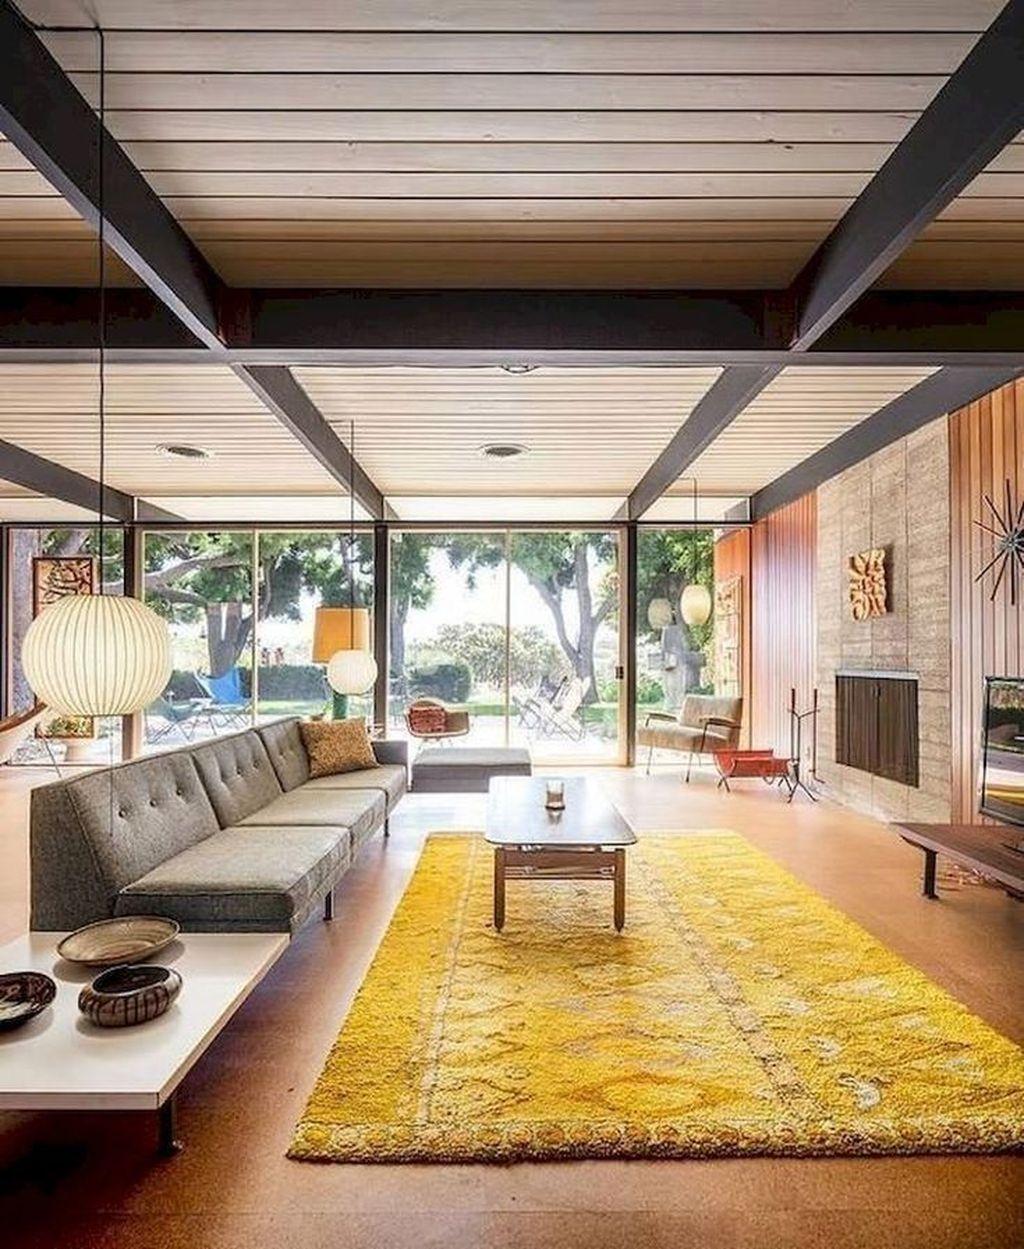 Admirable Mid Century Modern House Design Ideas 20